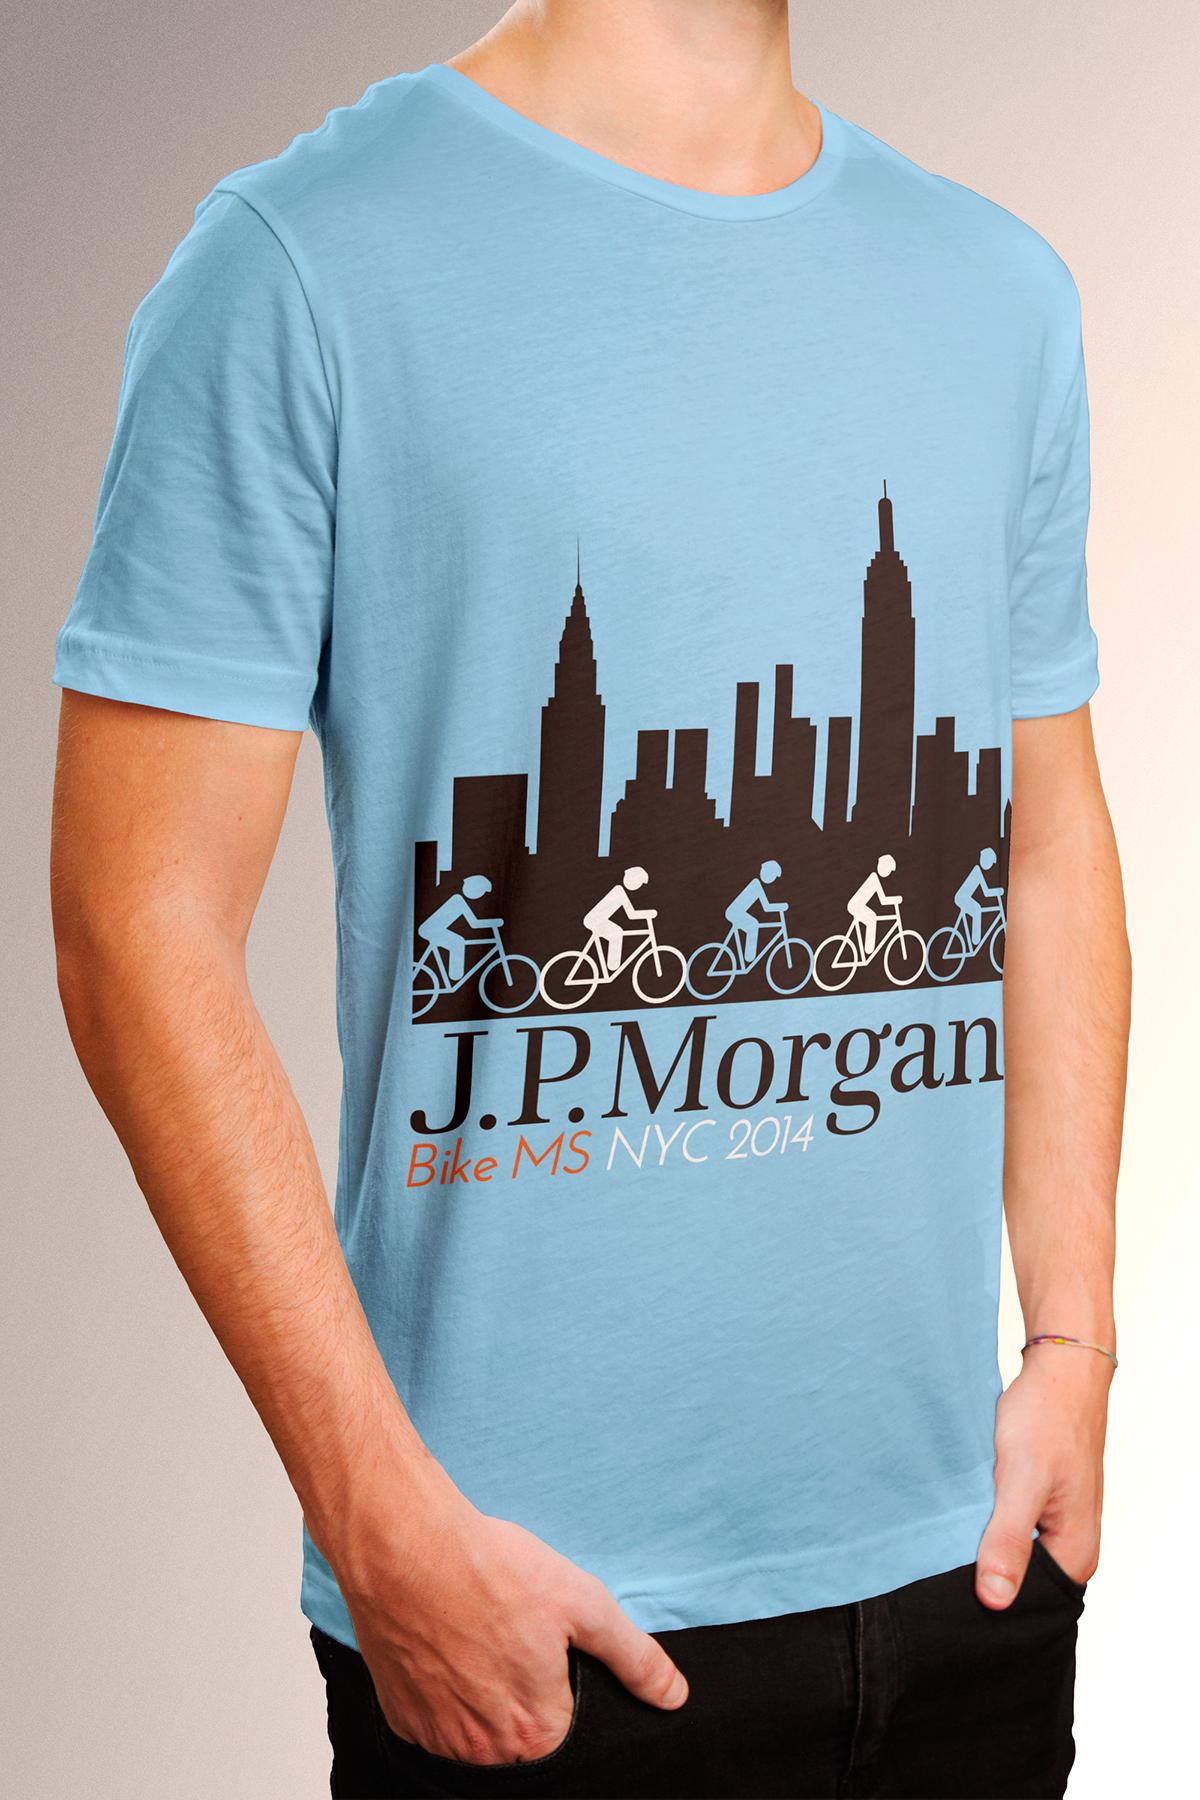 Tee Shirt Design Jp Morgan Chase Bike Ms Corporate On Behance